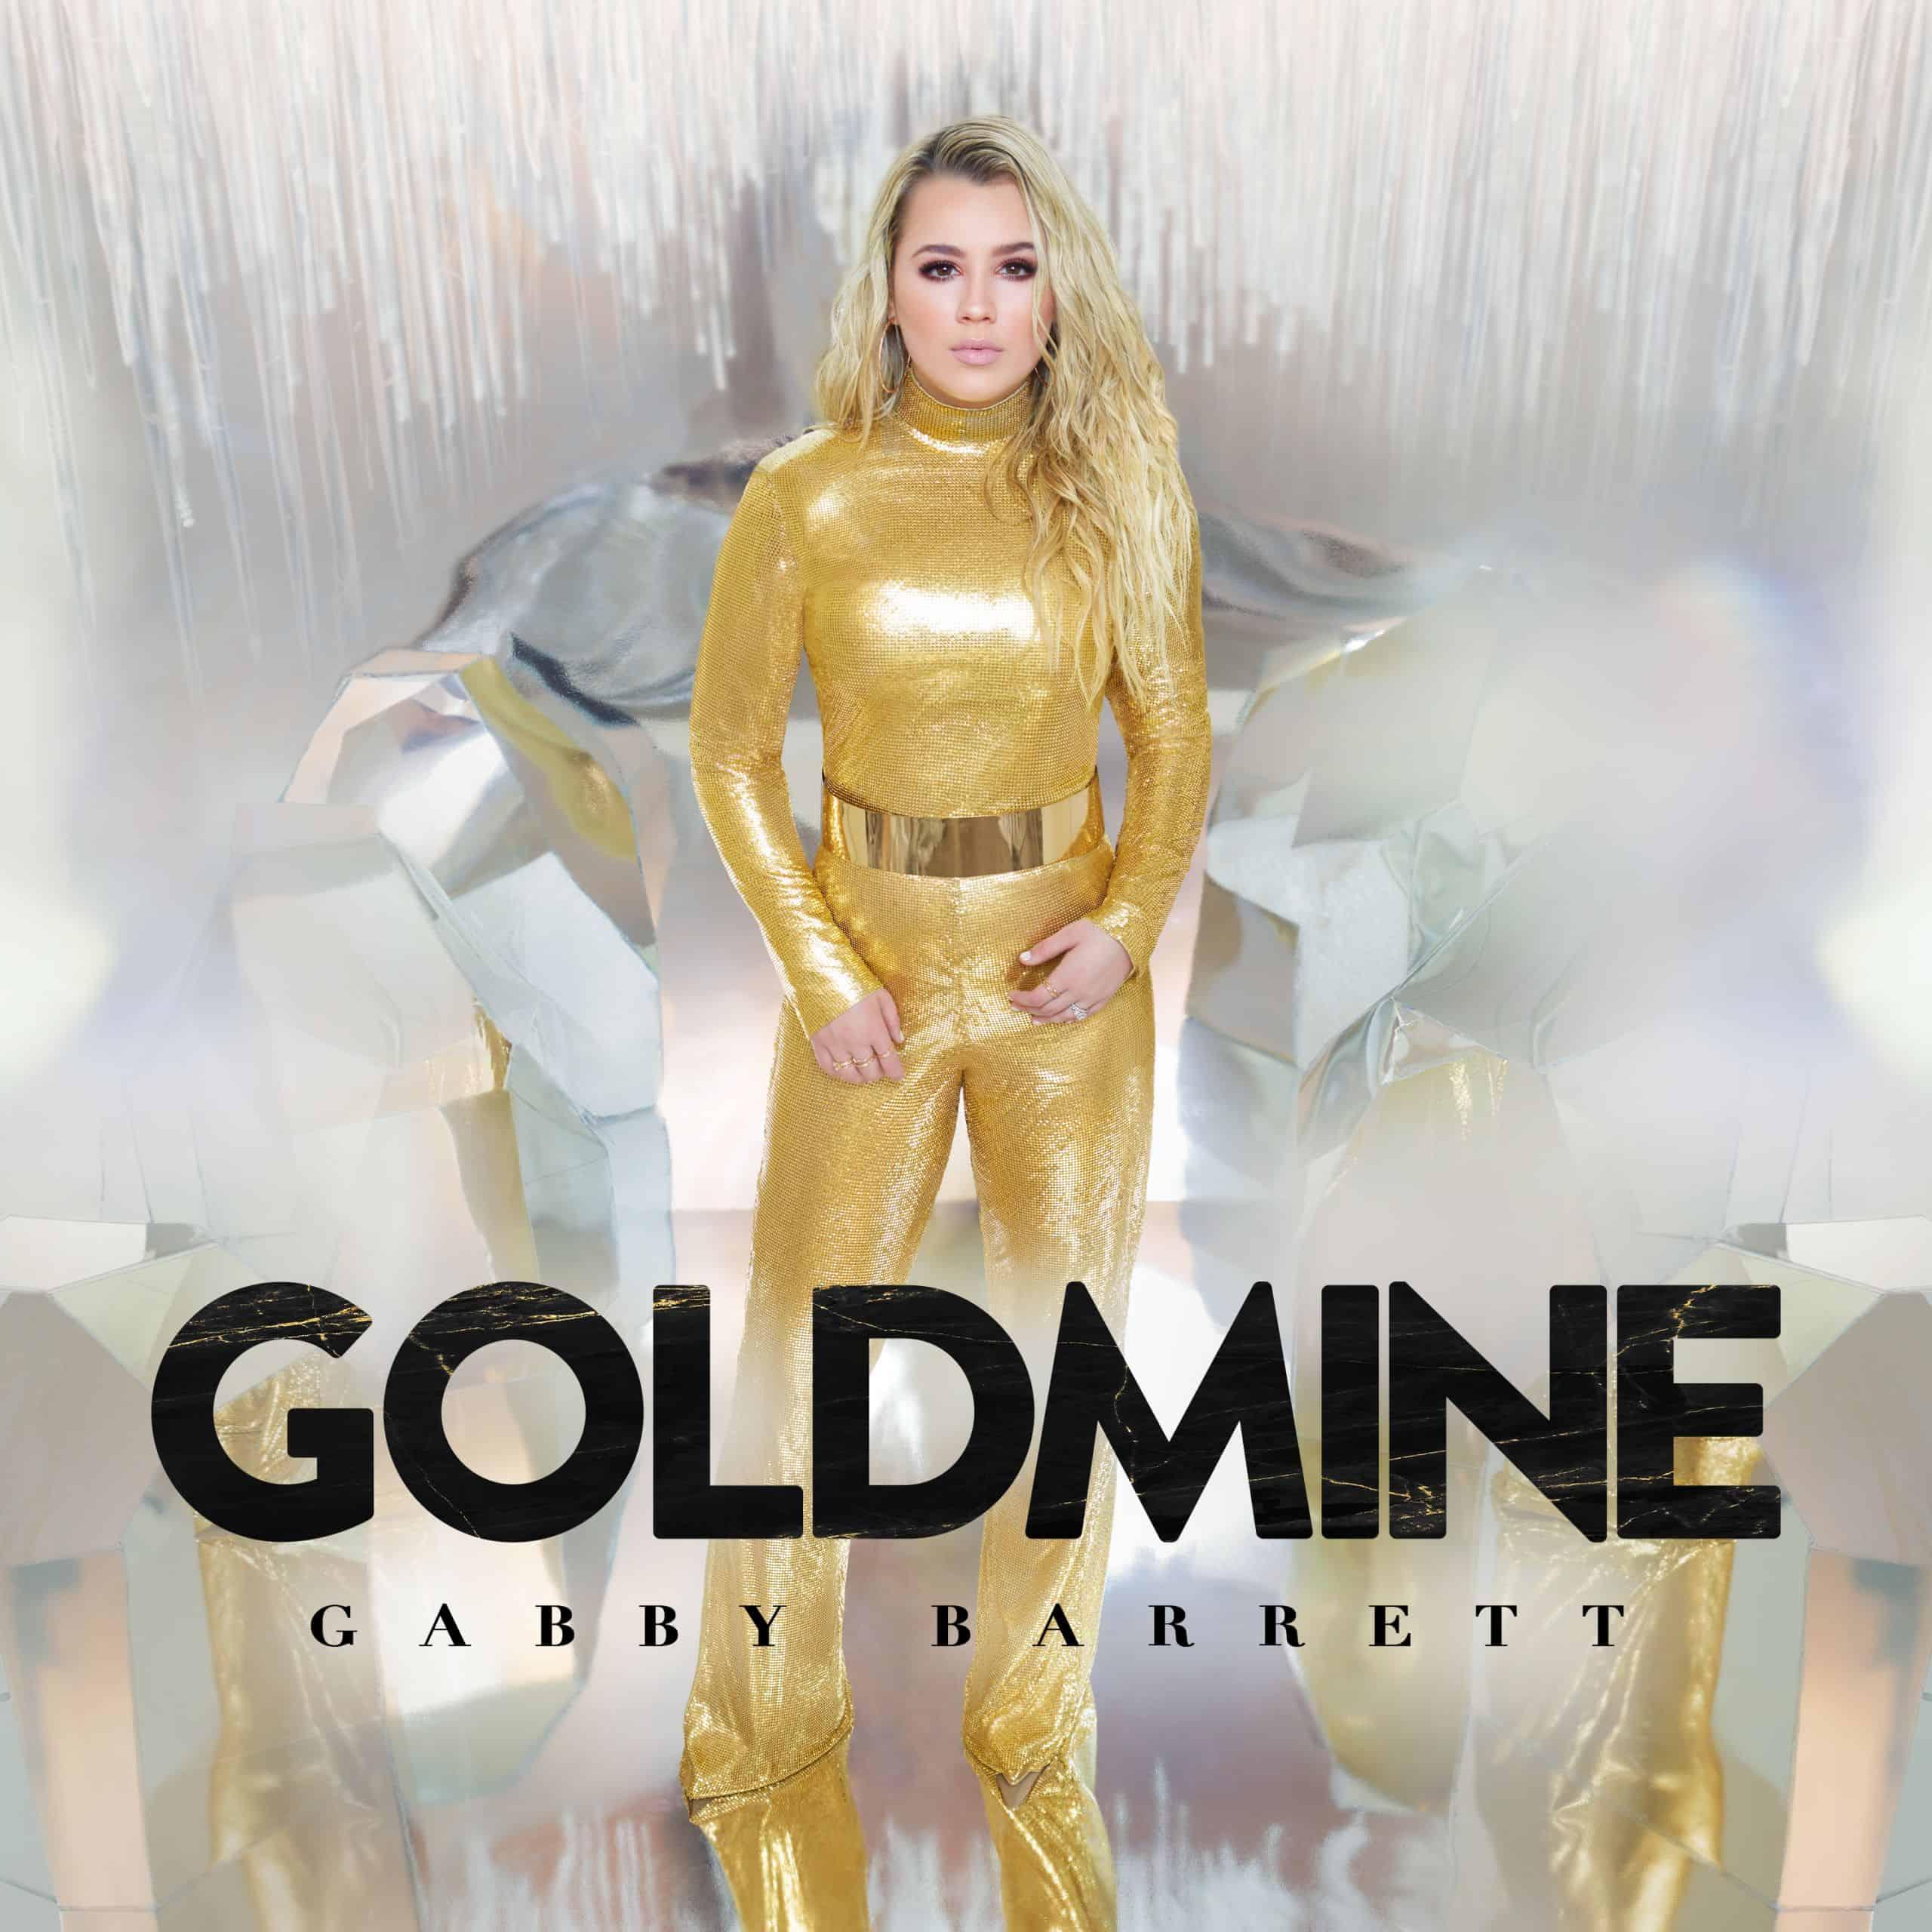 Gabby Barrett, Goldmine Album Art